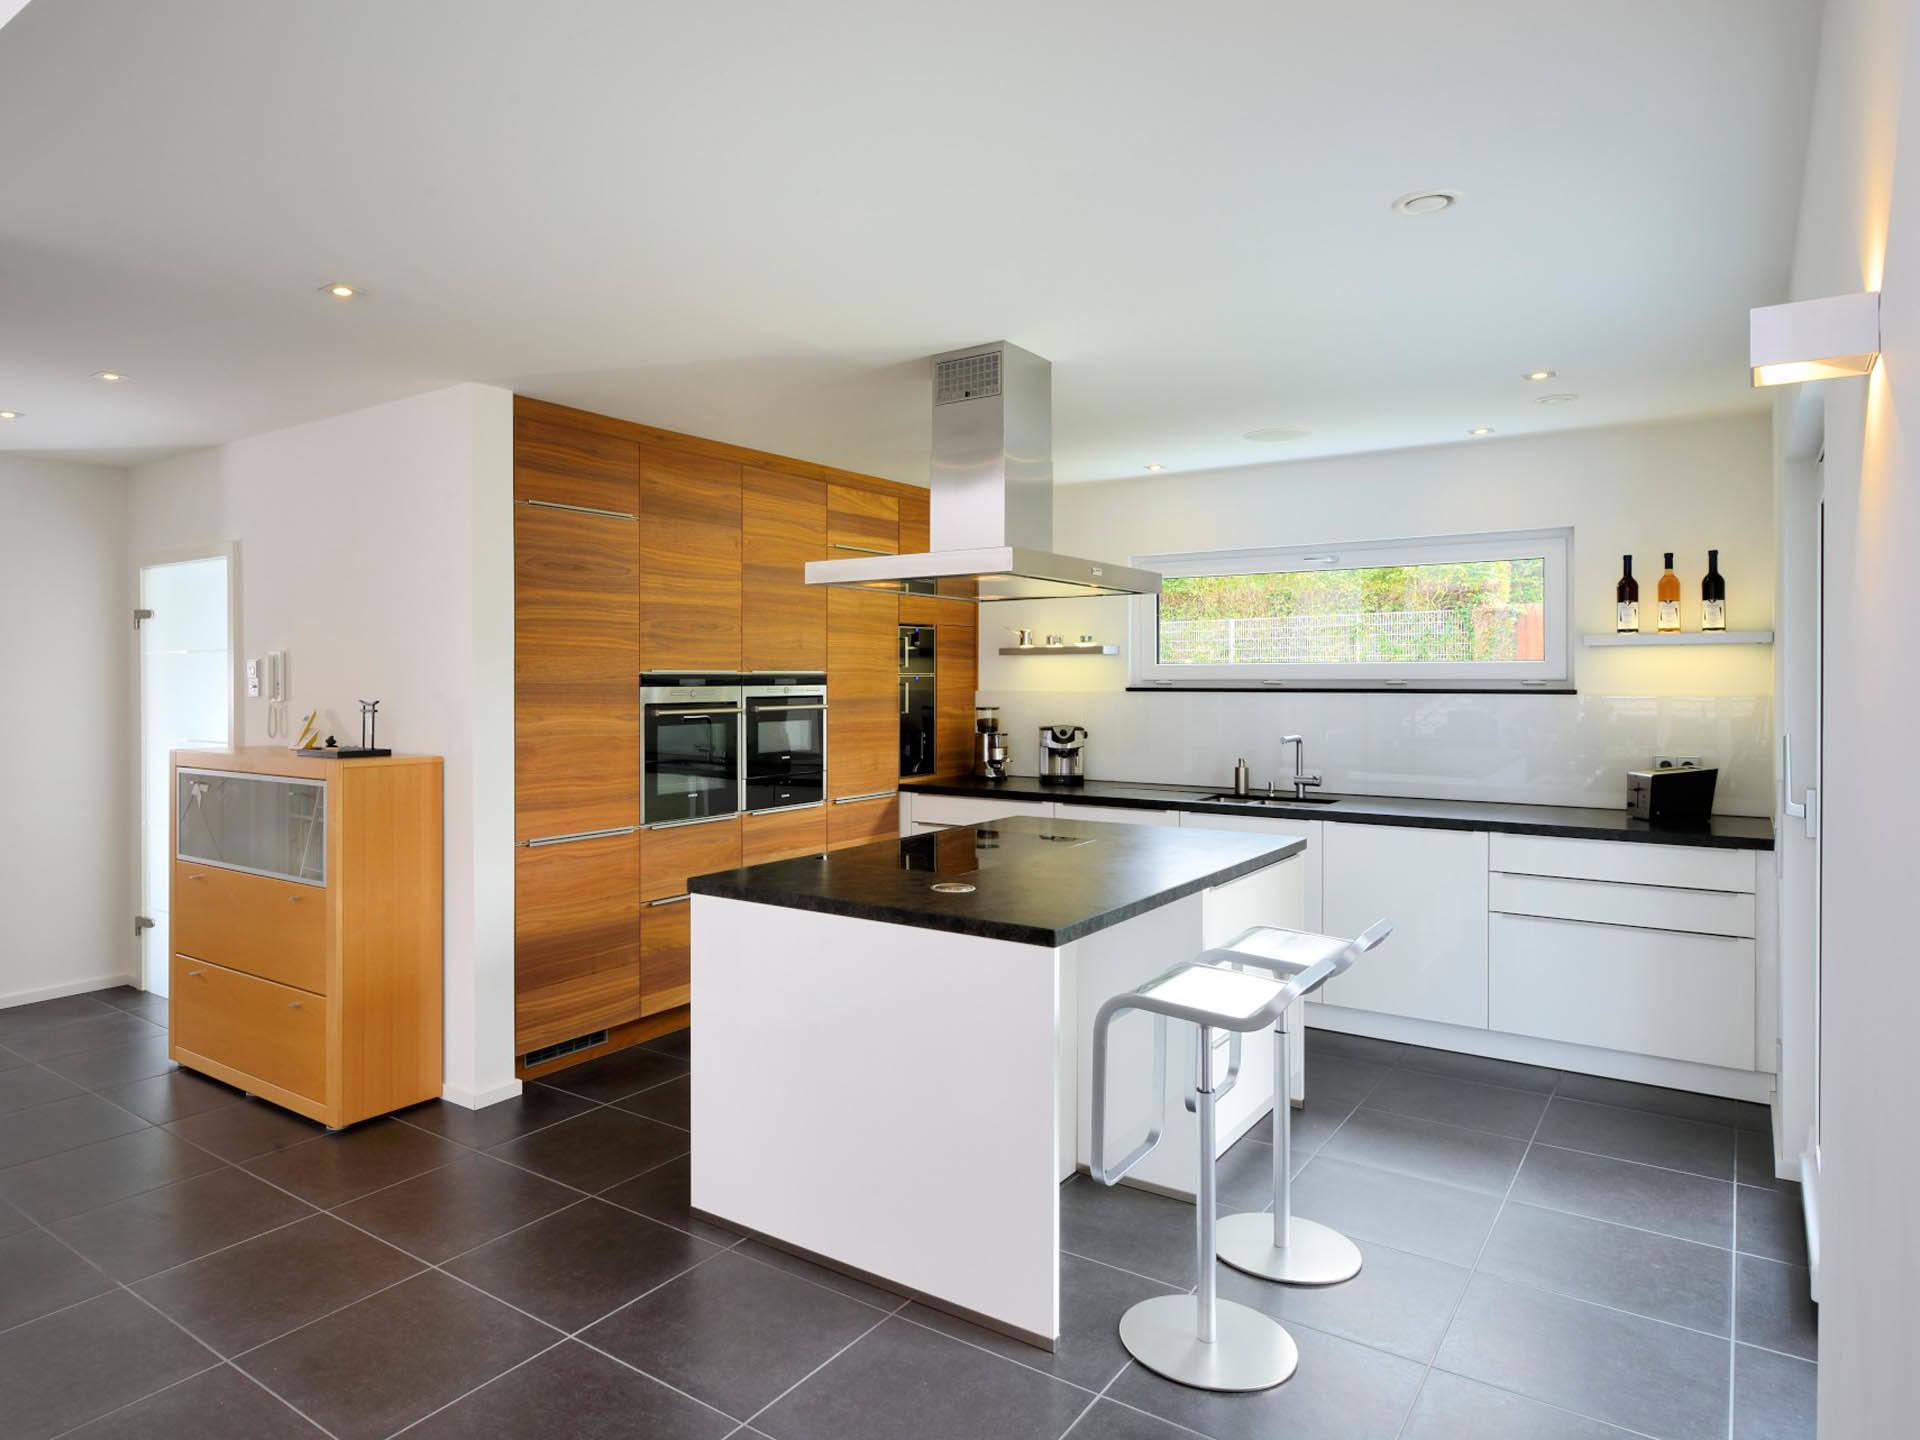 Schichtstoffplatten Küche | Schichtstoffplatten Kuche Bauhaus Muller Mobelwerkstatten Konnex